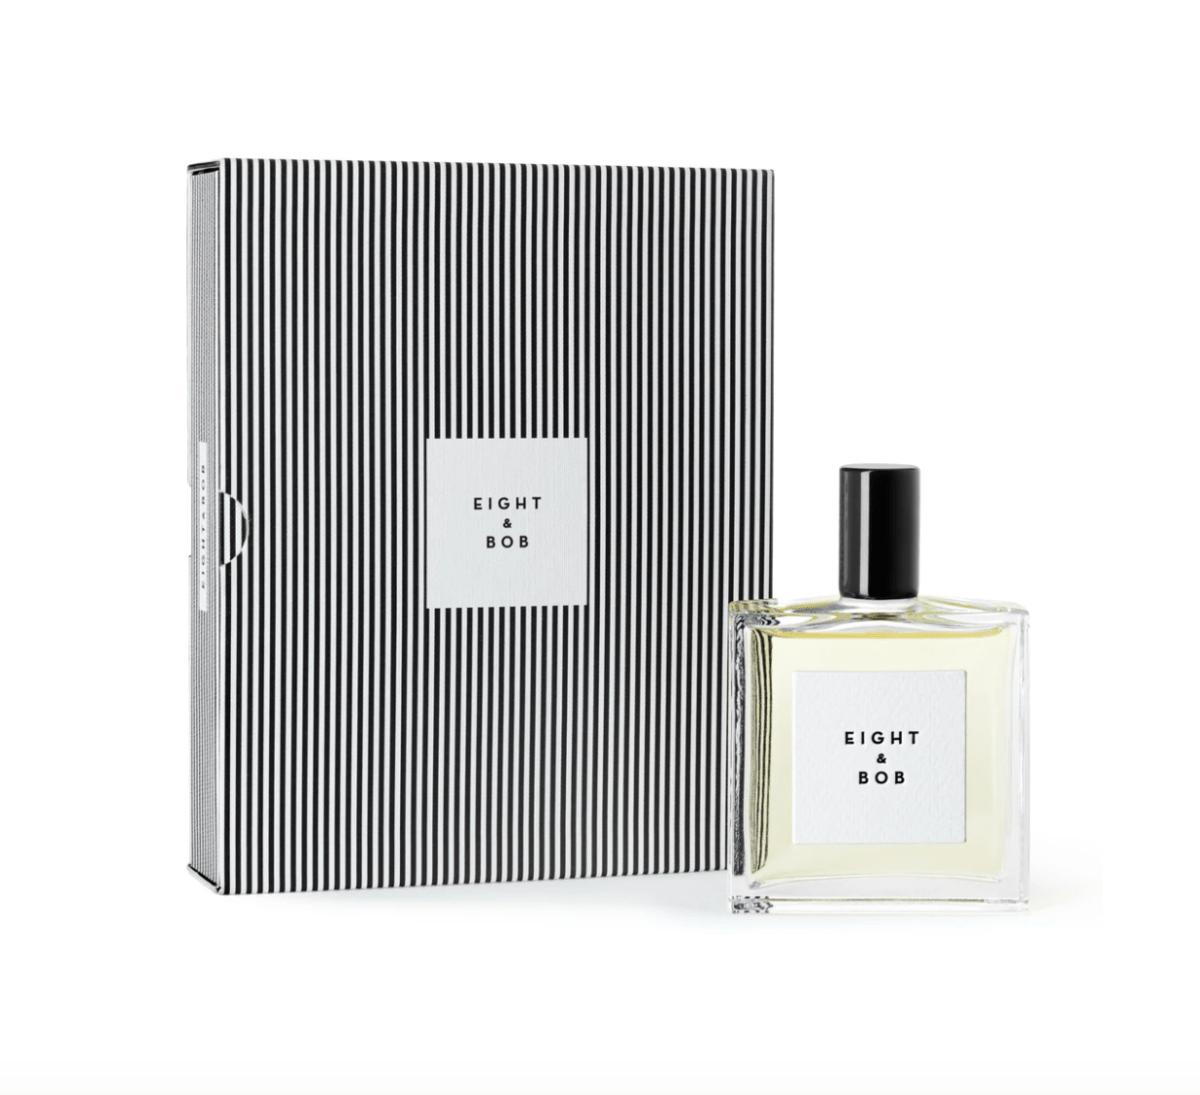 Eight & Bob Eau De Parfum 100 Ml